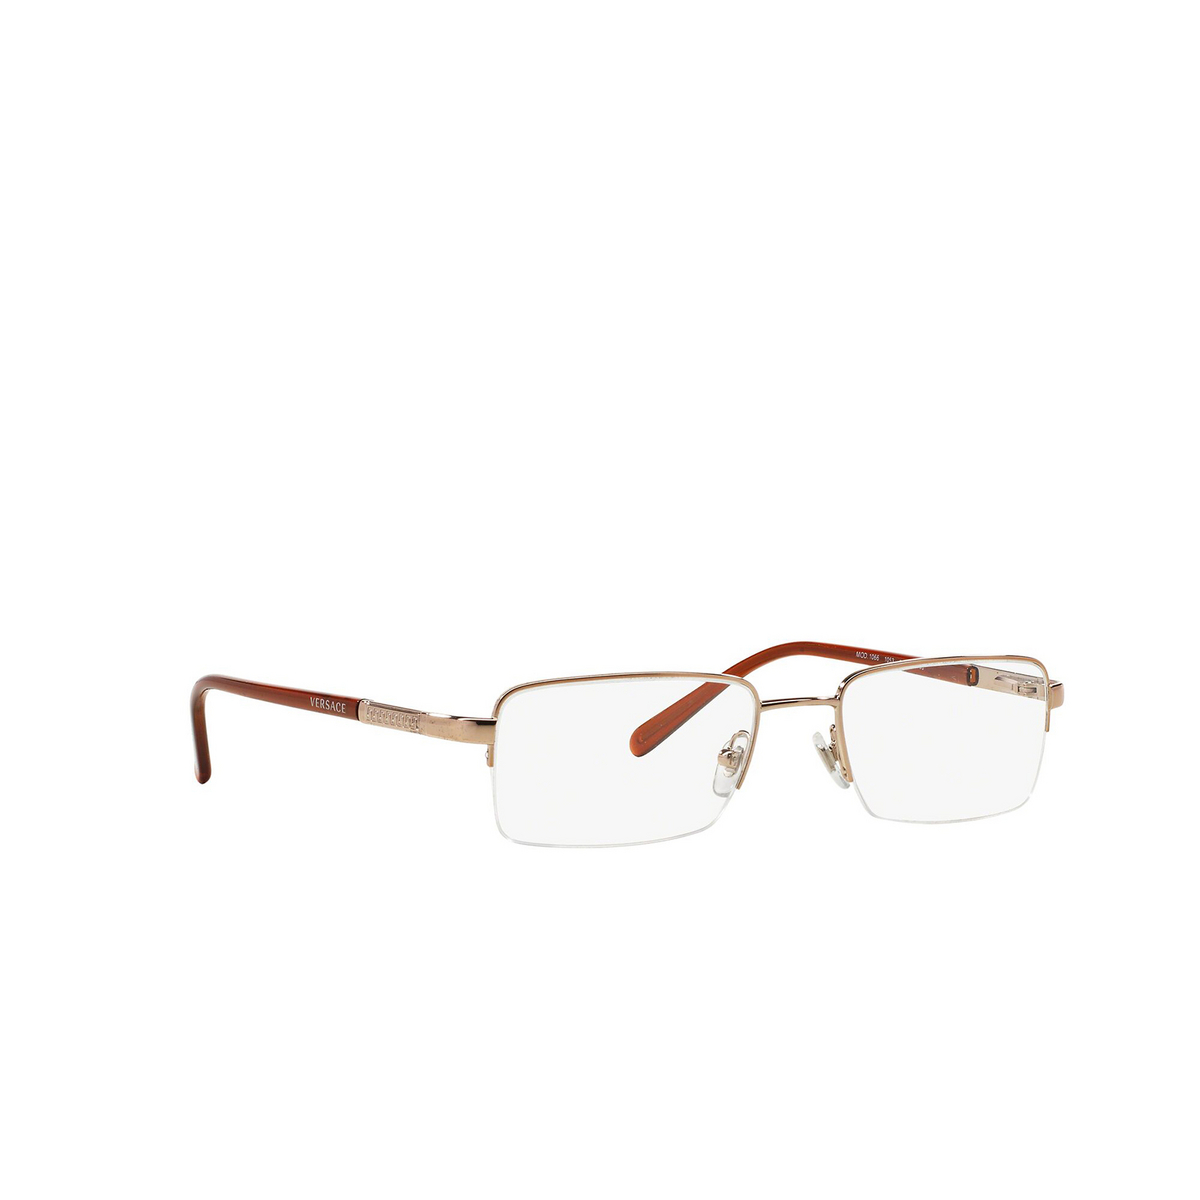 Versace® Rectangle Eyeglasses: VE1066 color Bronze Copper 1053.